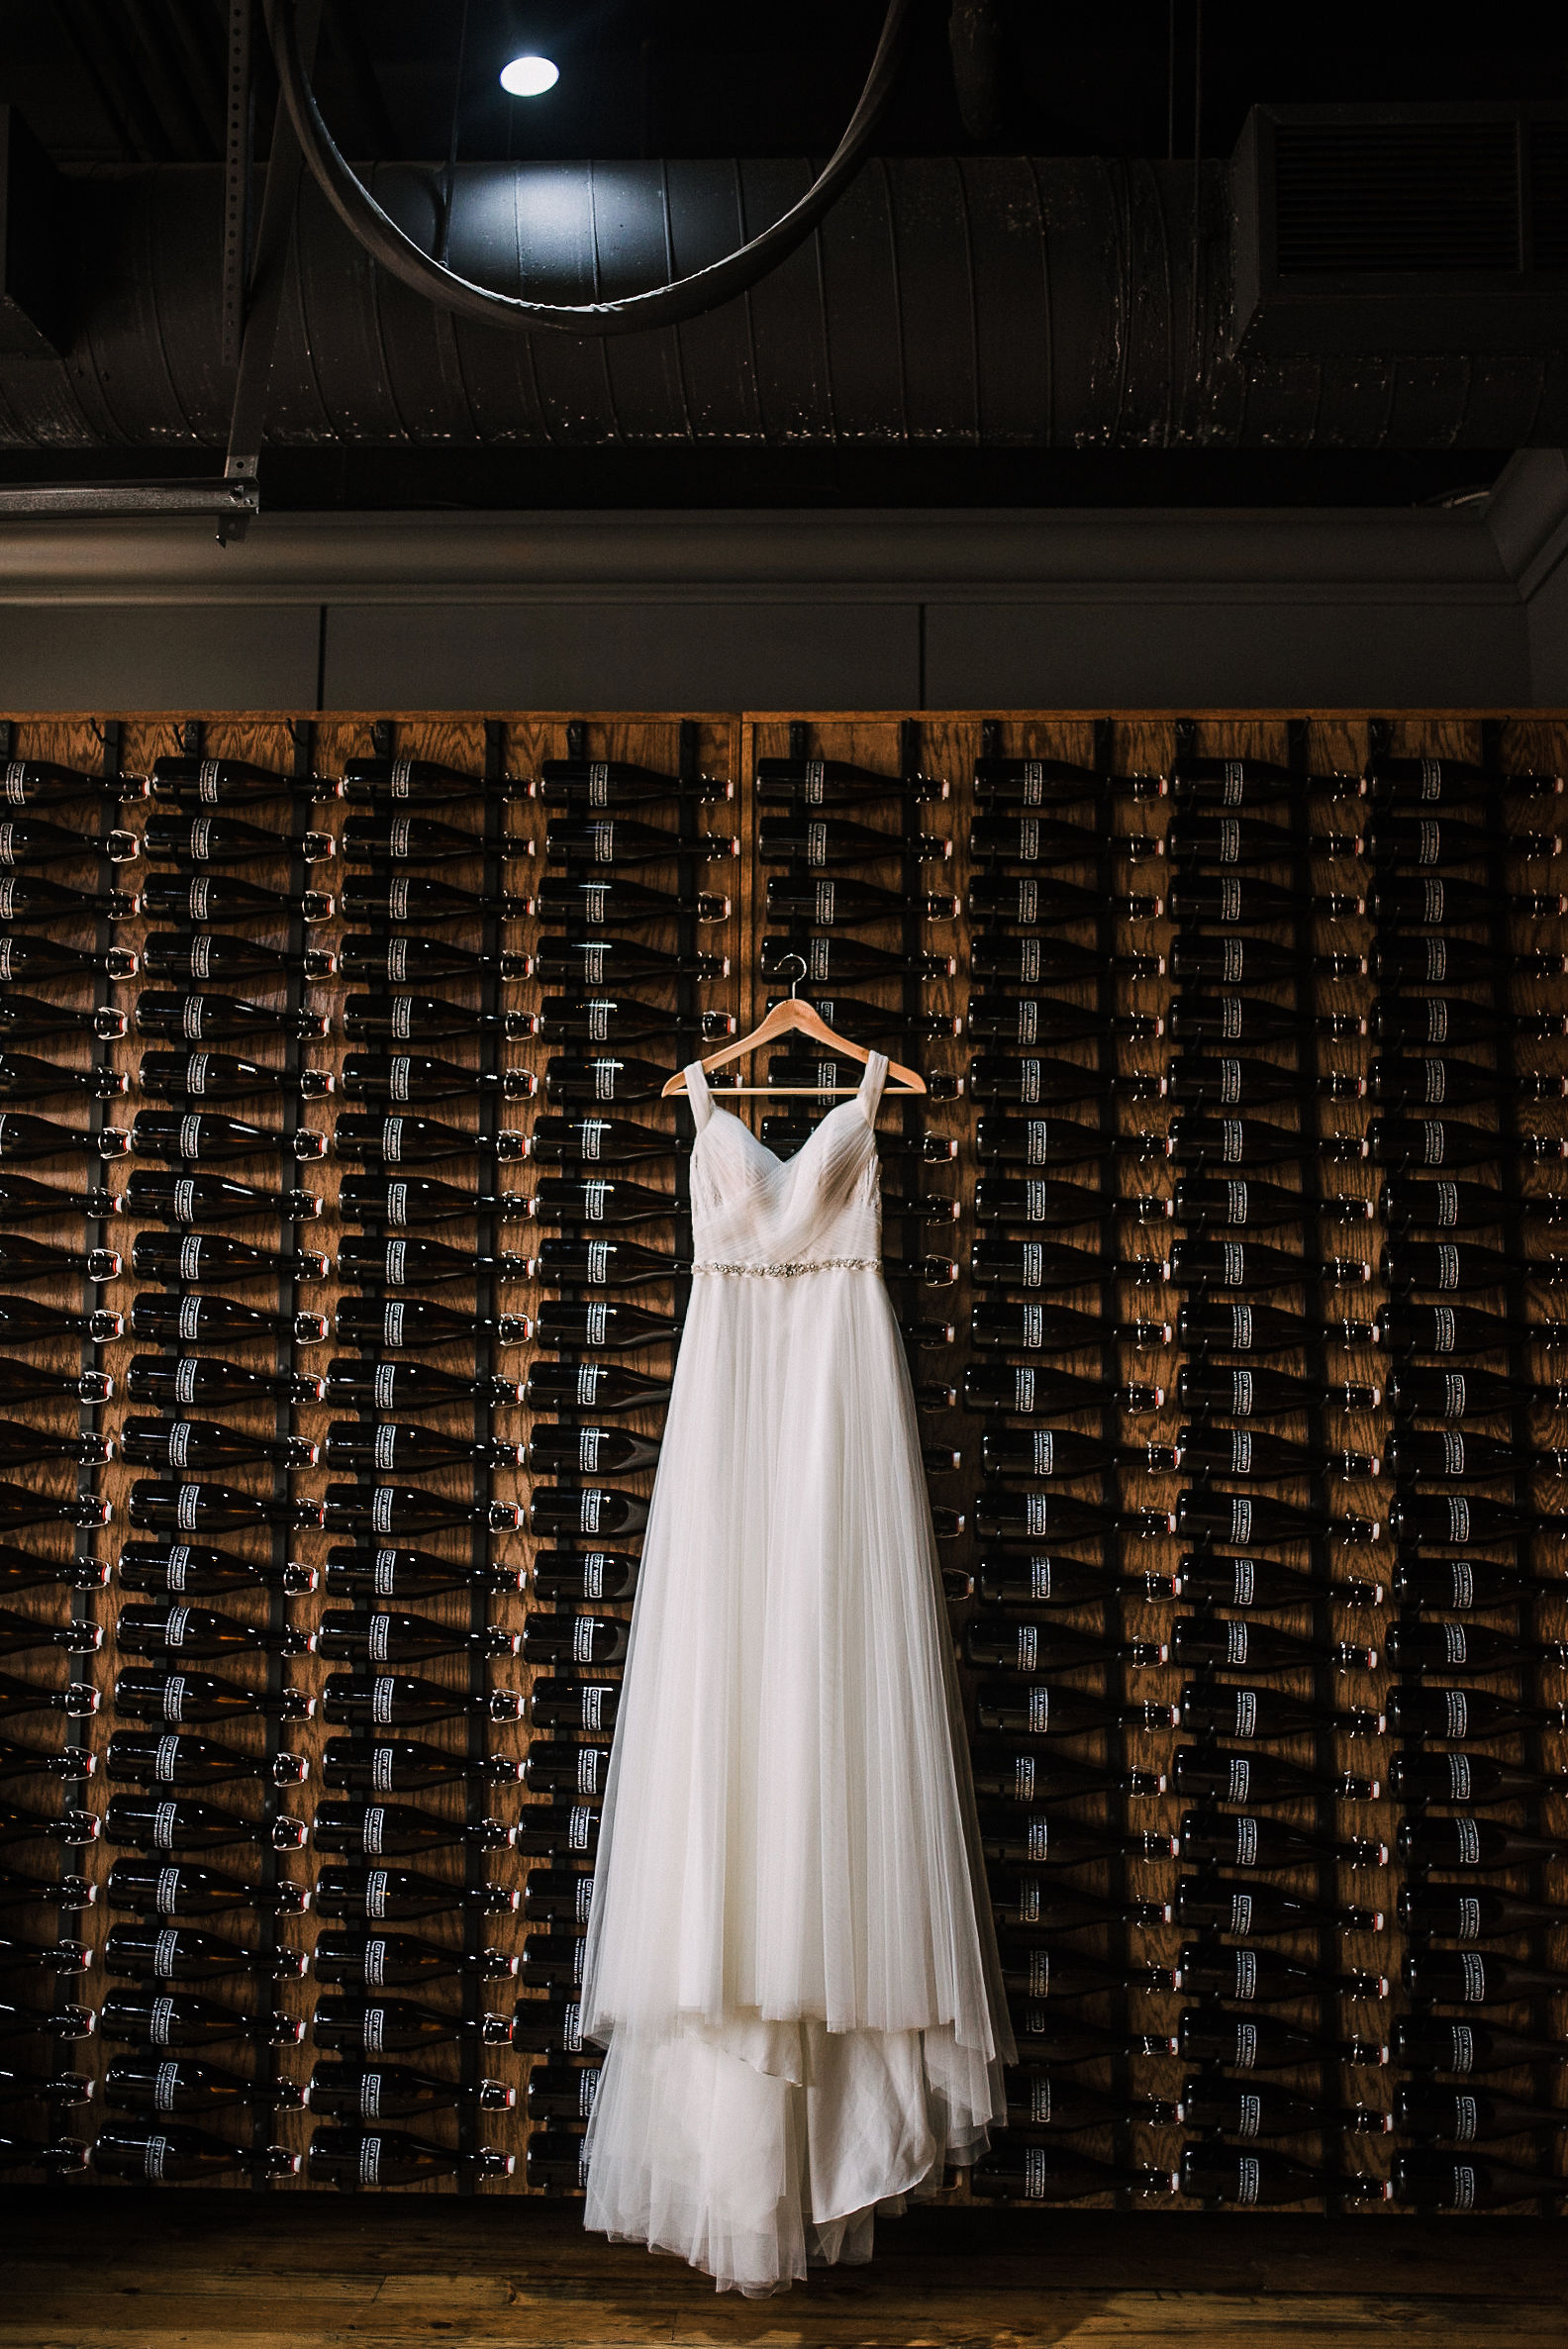 wedding dress detail shot at City Winery in Washington DC